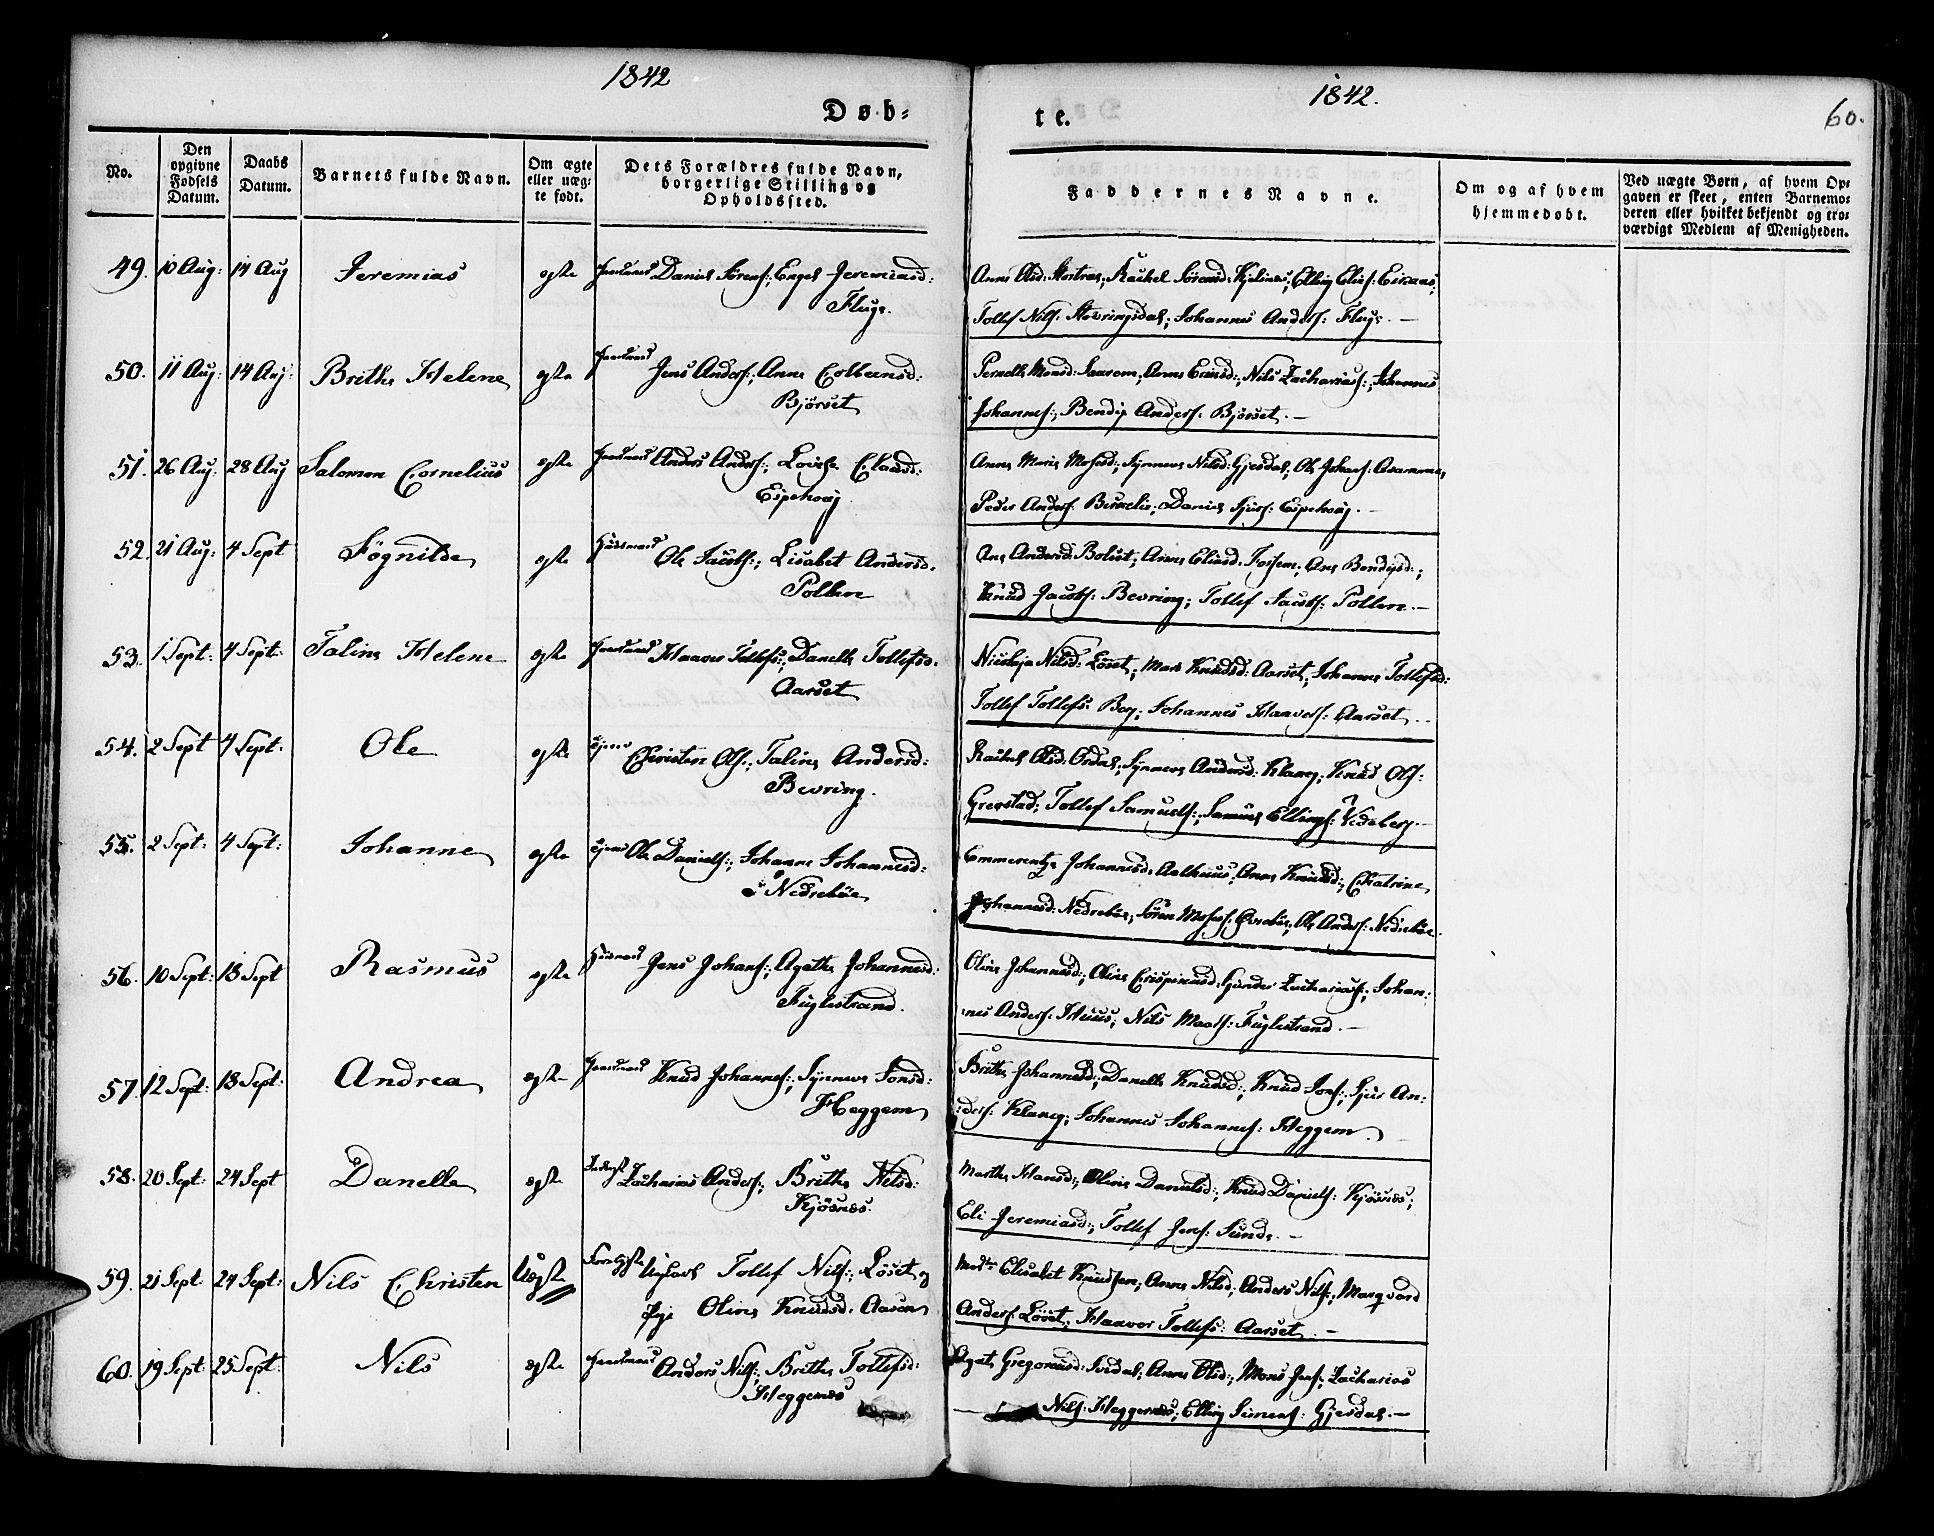 SAB, Jølster sokneprestembete, H/Haa/Haaa/L0009: Parish register (official) no. A 9, 1833-1848, p. 60